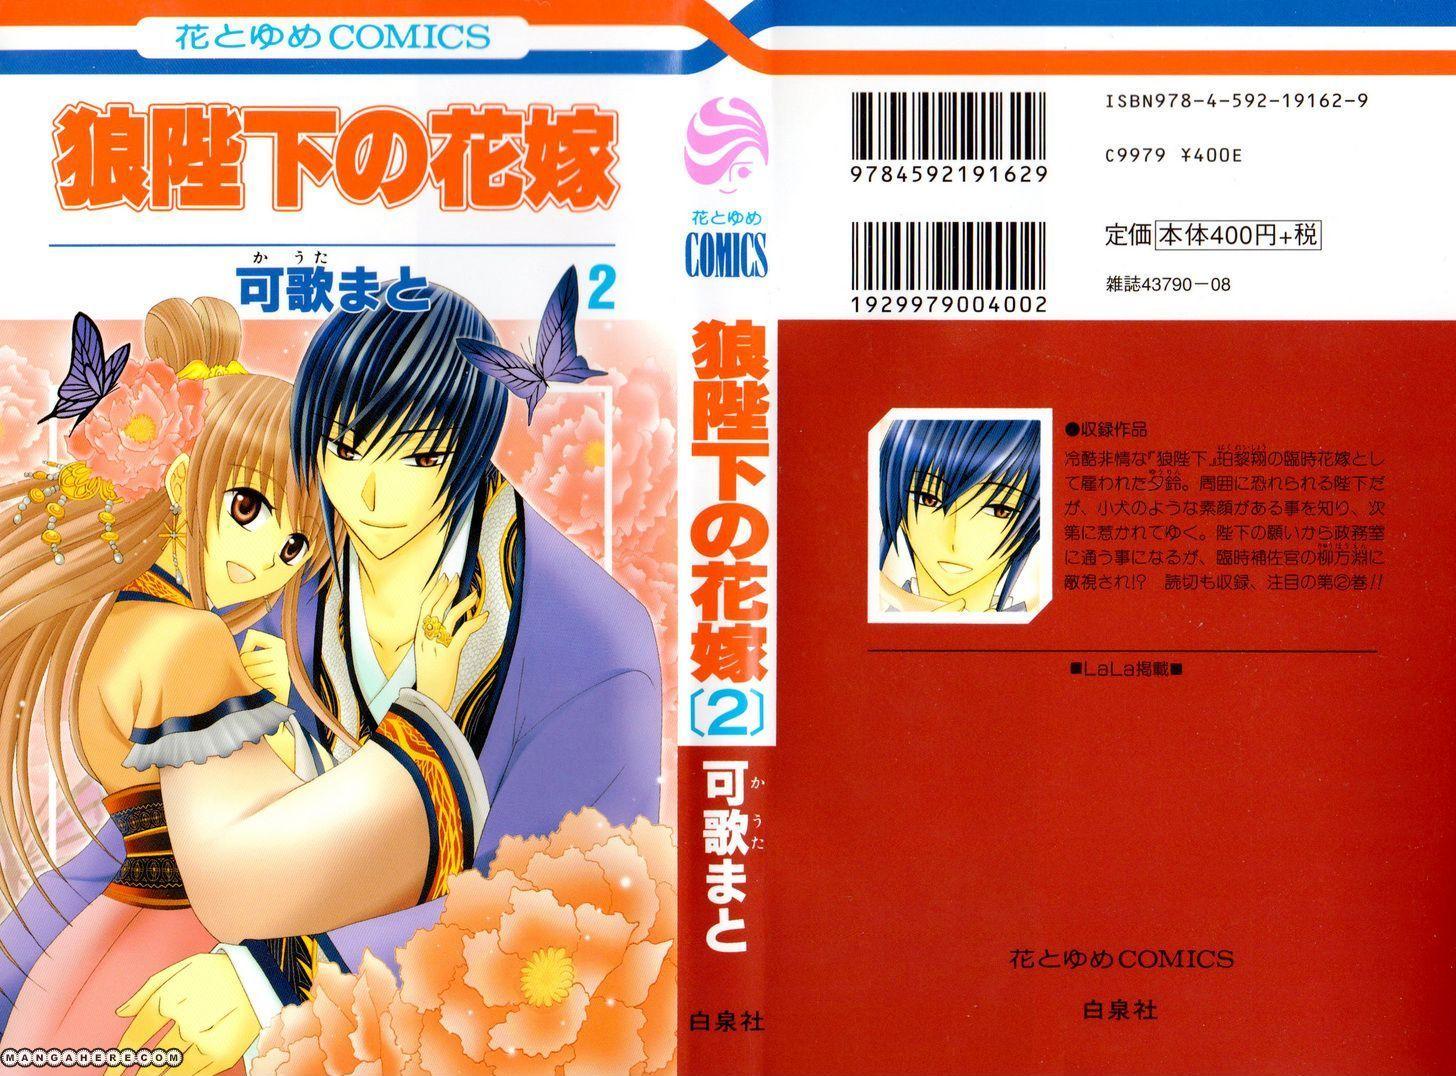 Ookami-heika no Hanayome 5 Page 1